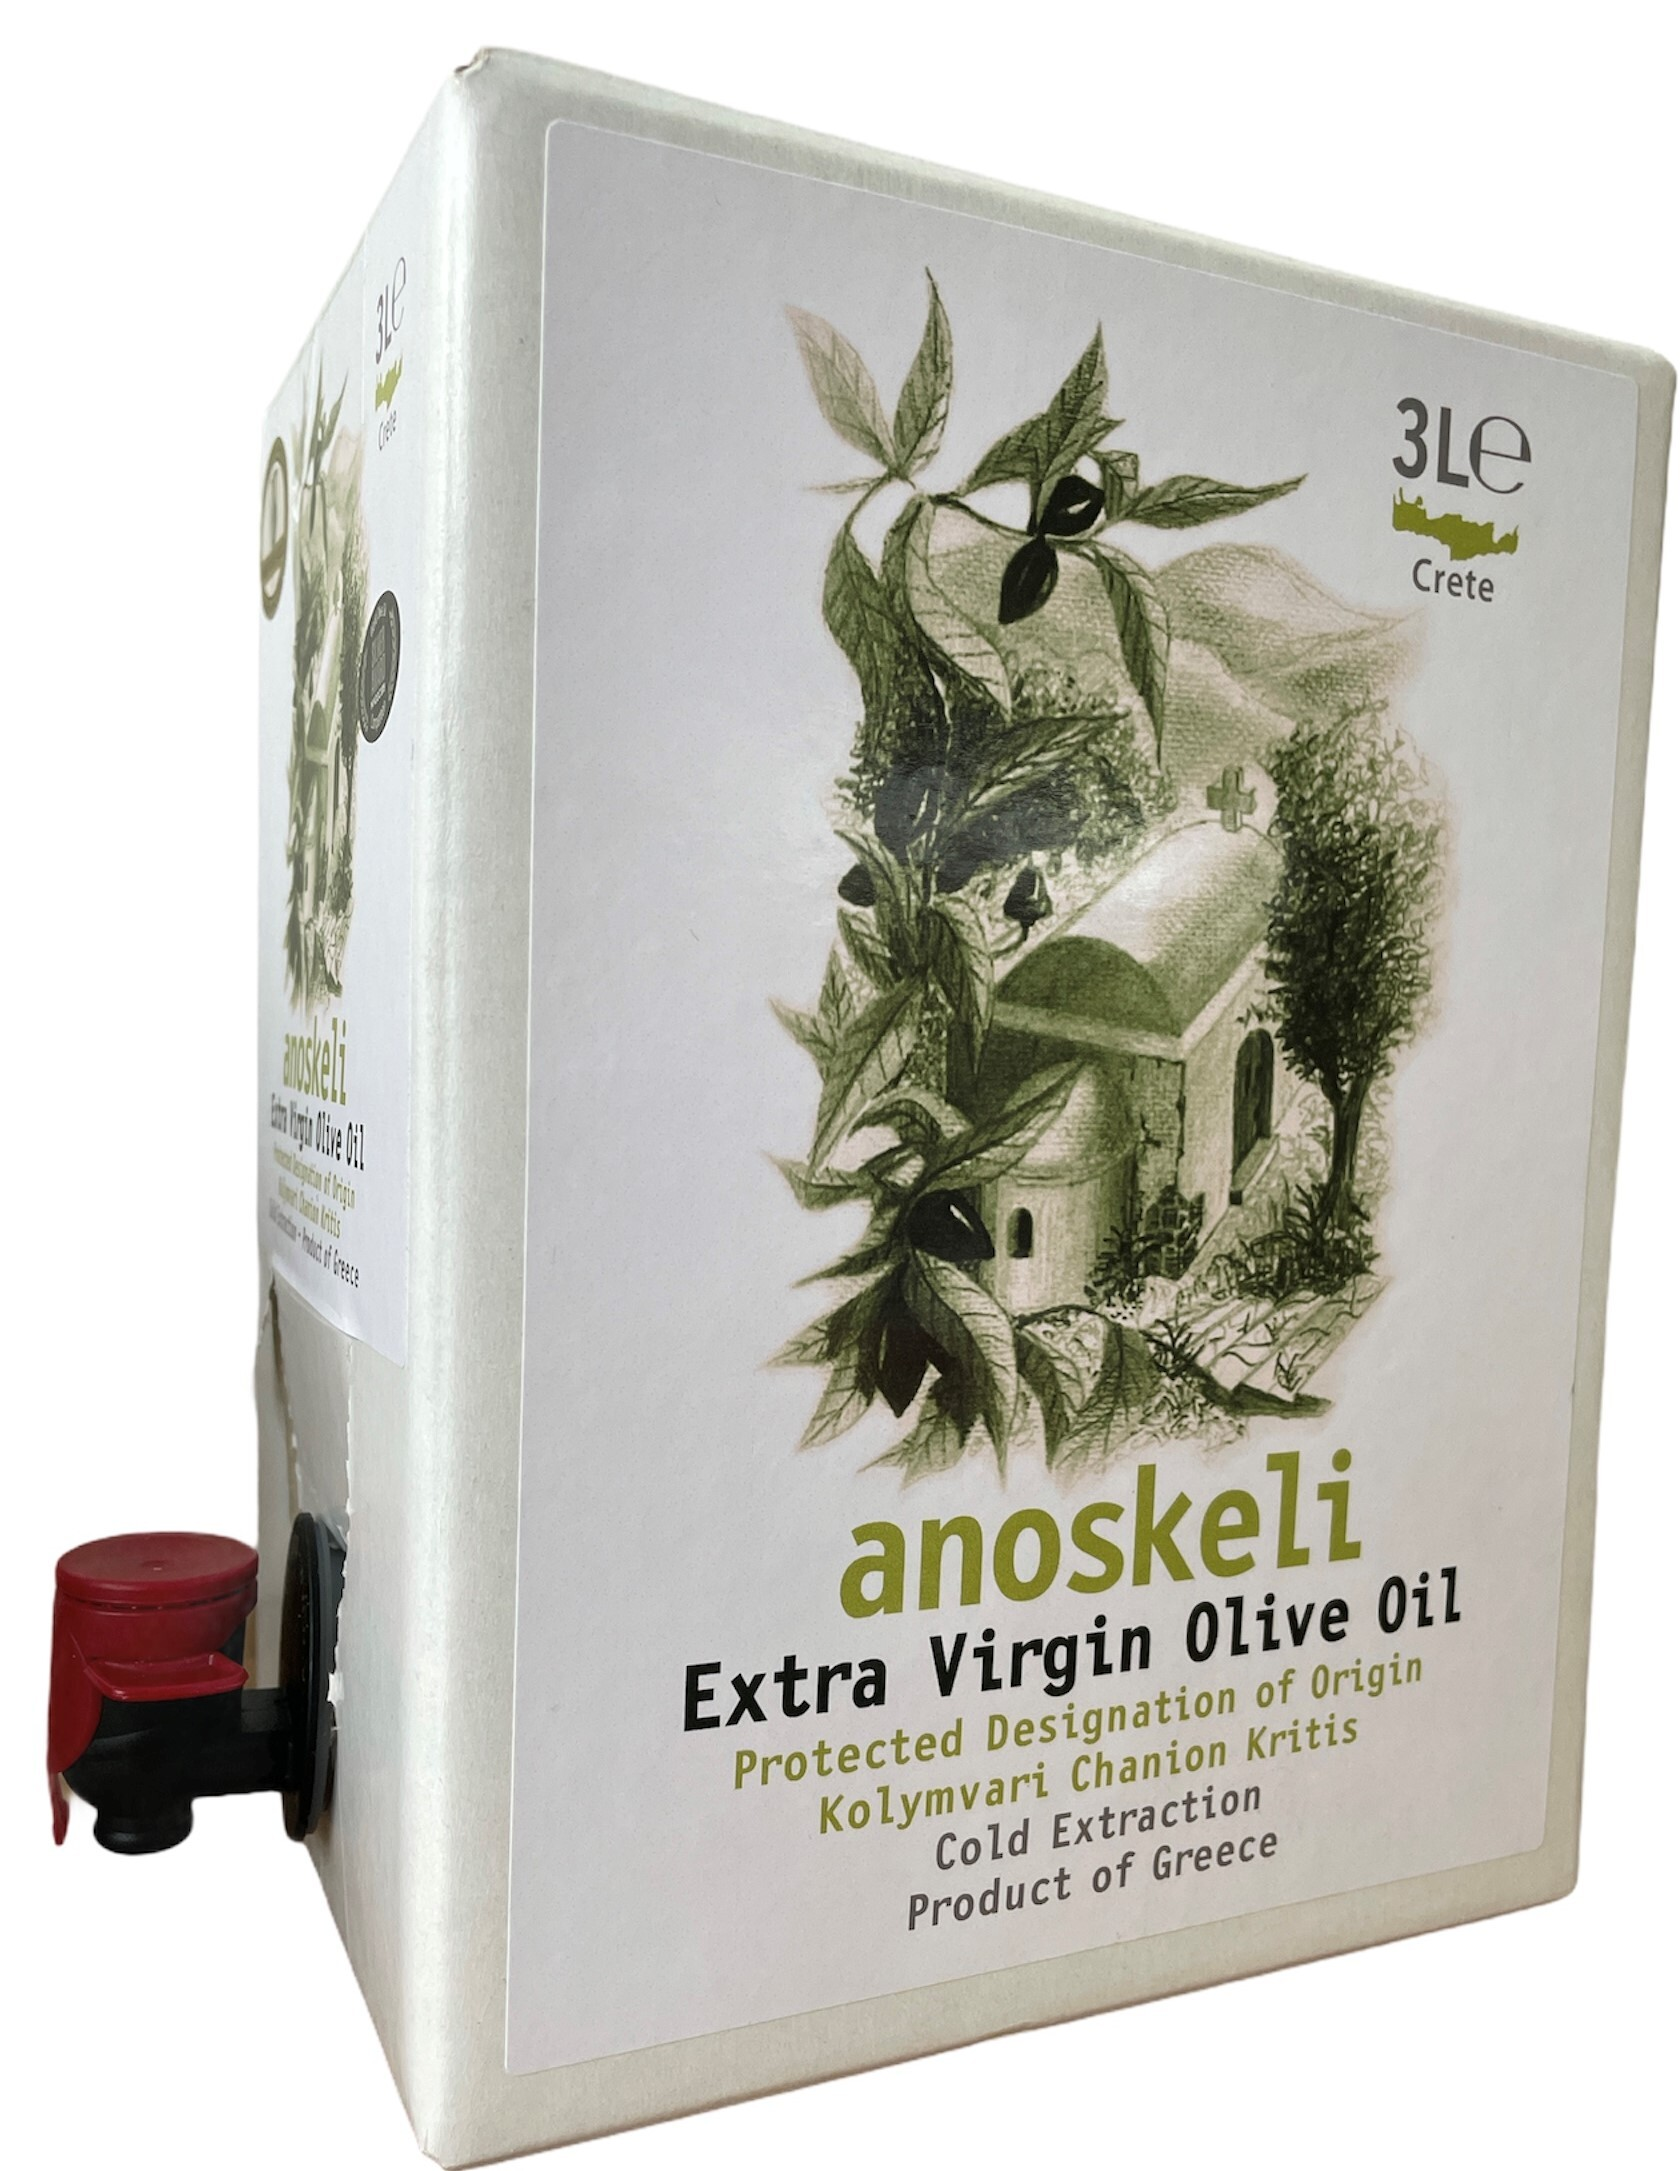 Olivenolie fra CretanGreen - 3L bag in box